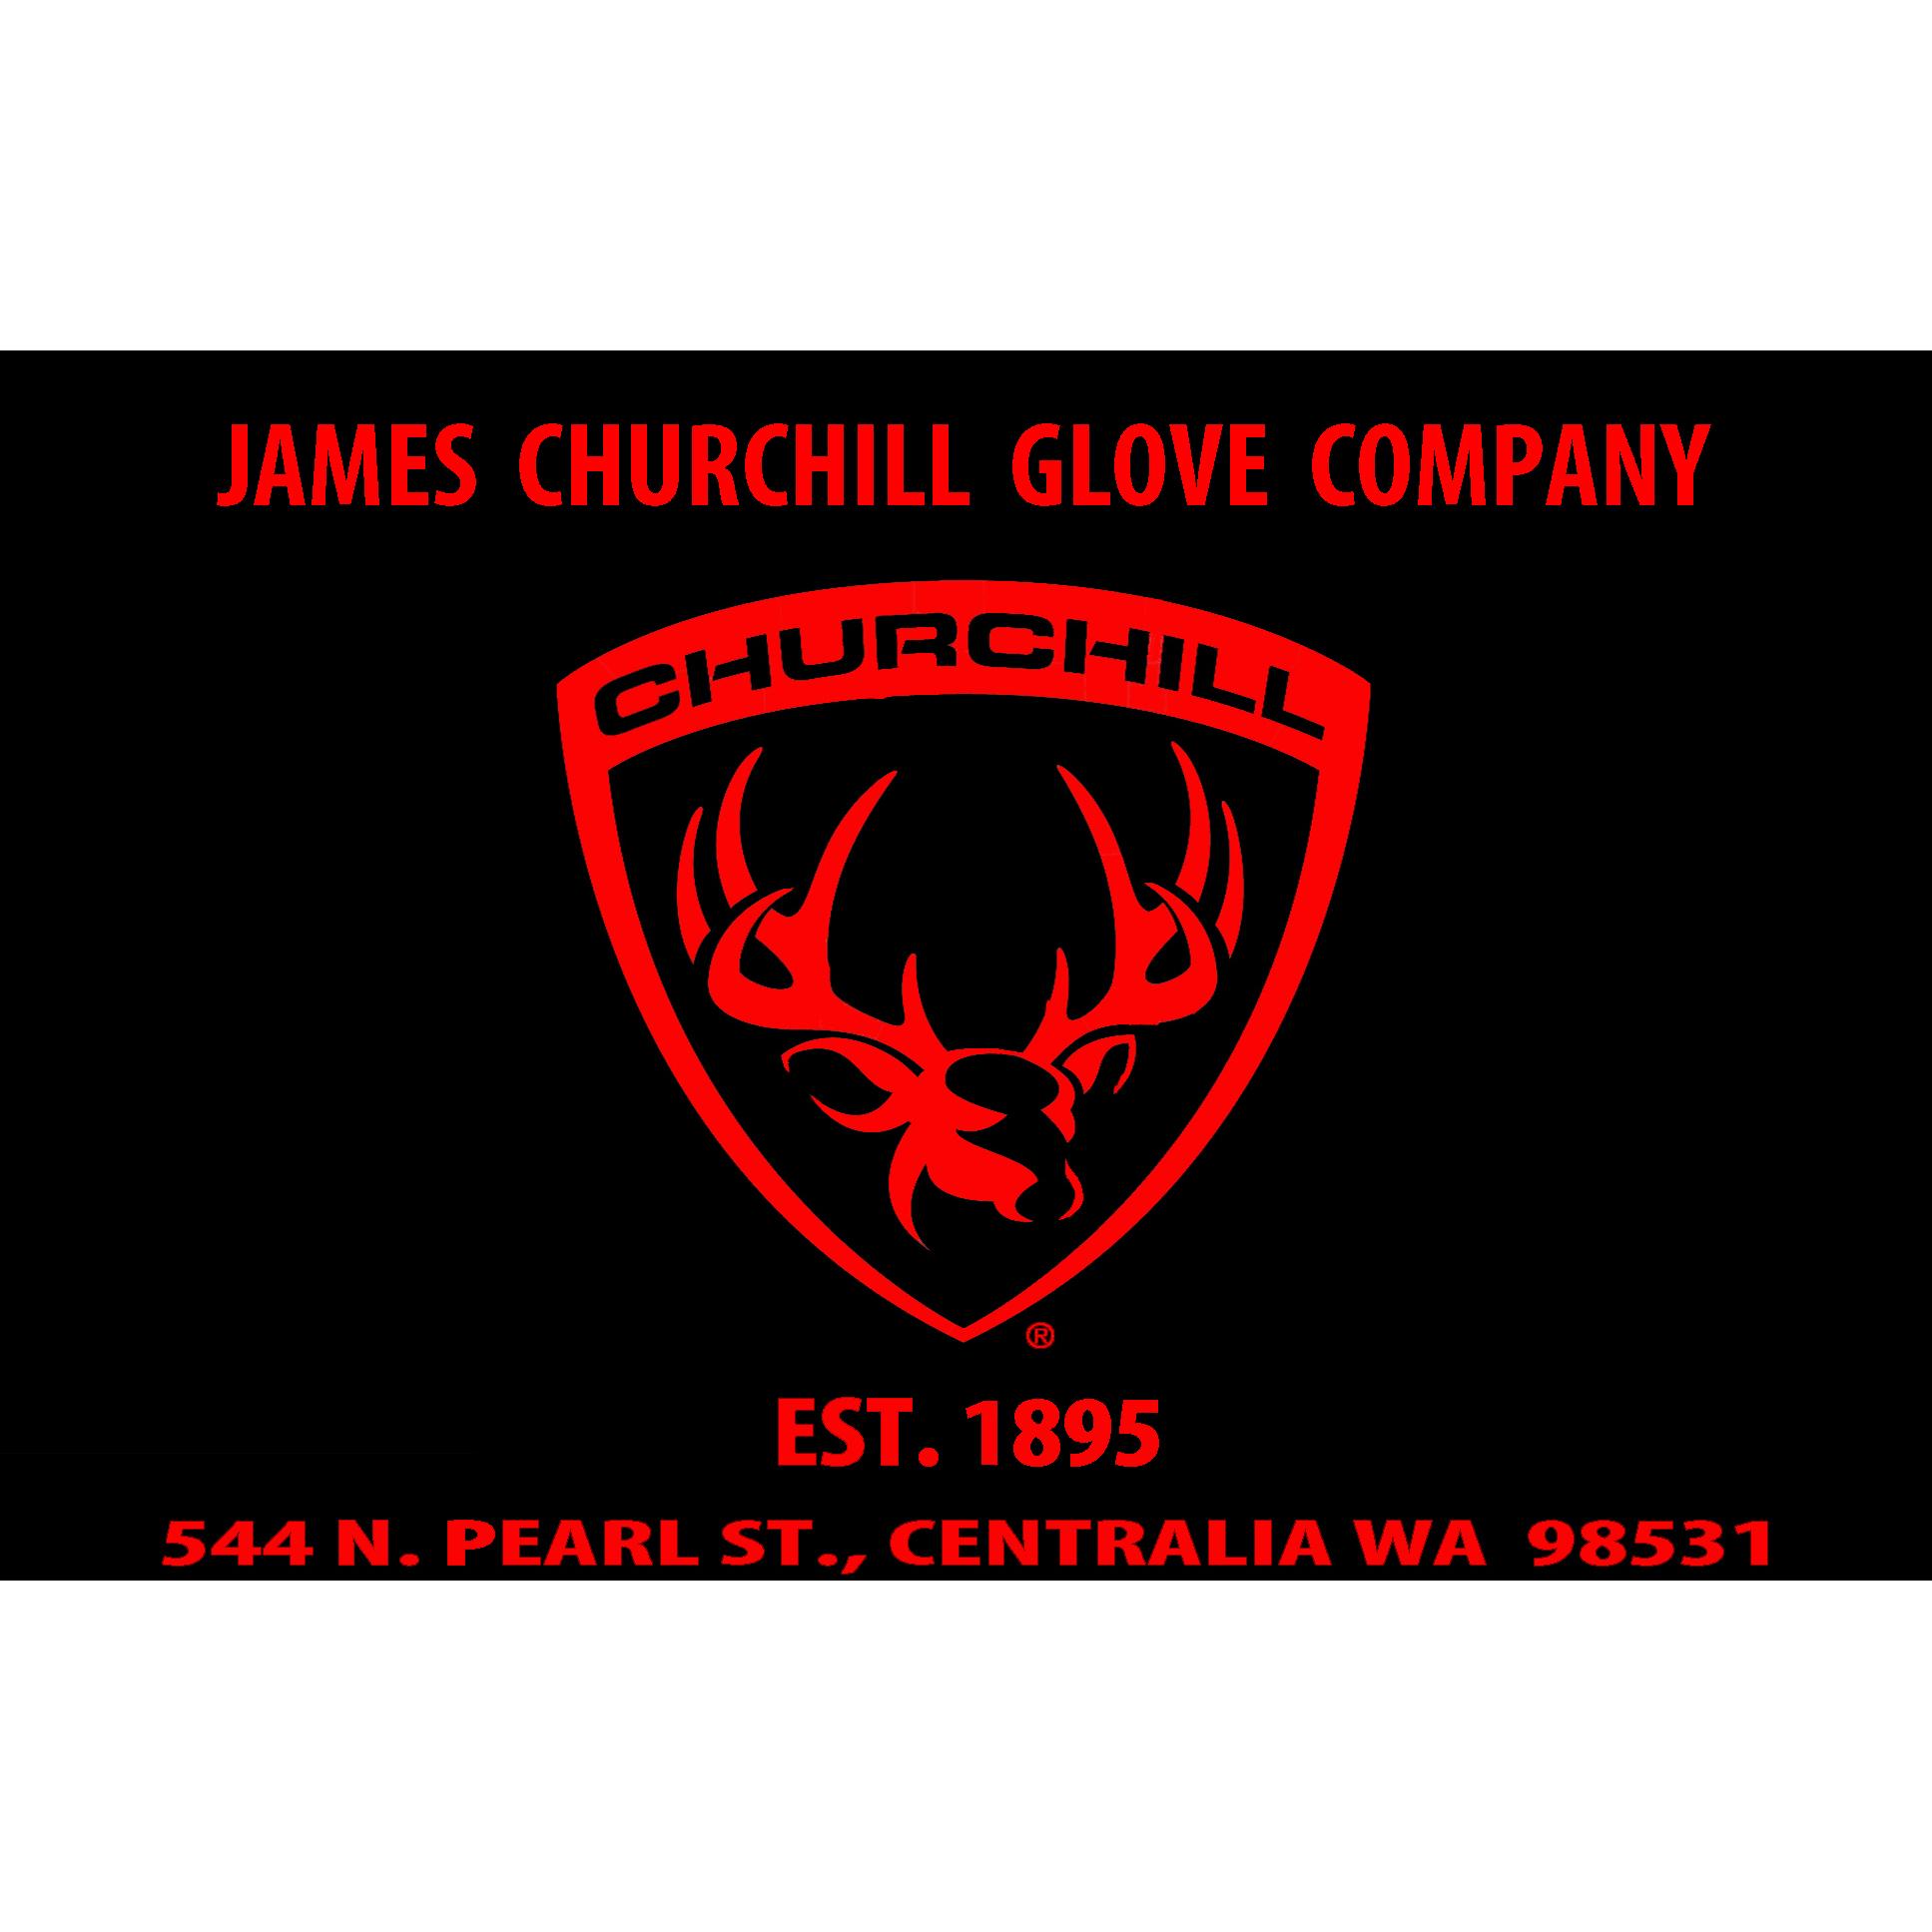 James Churchill Glove Co.